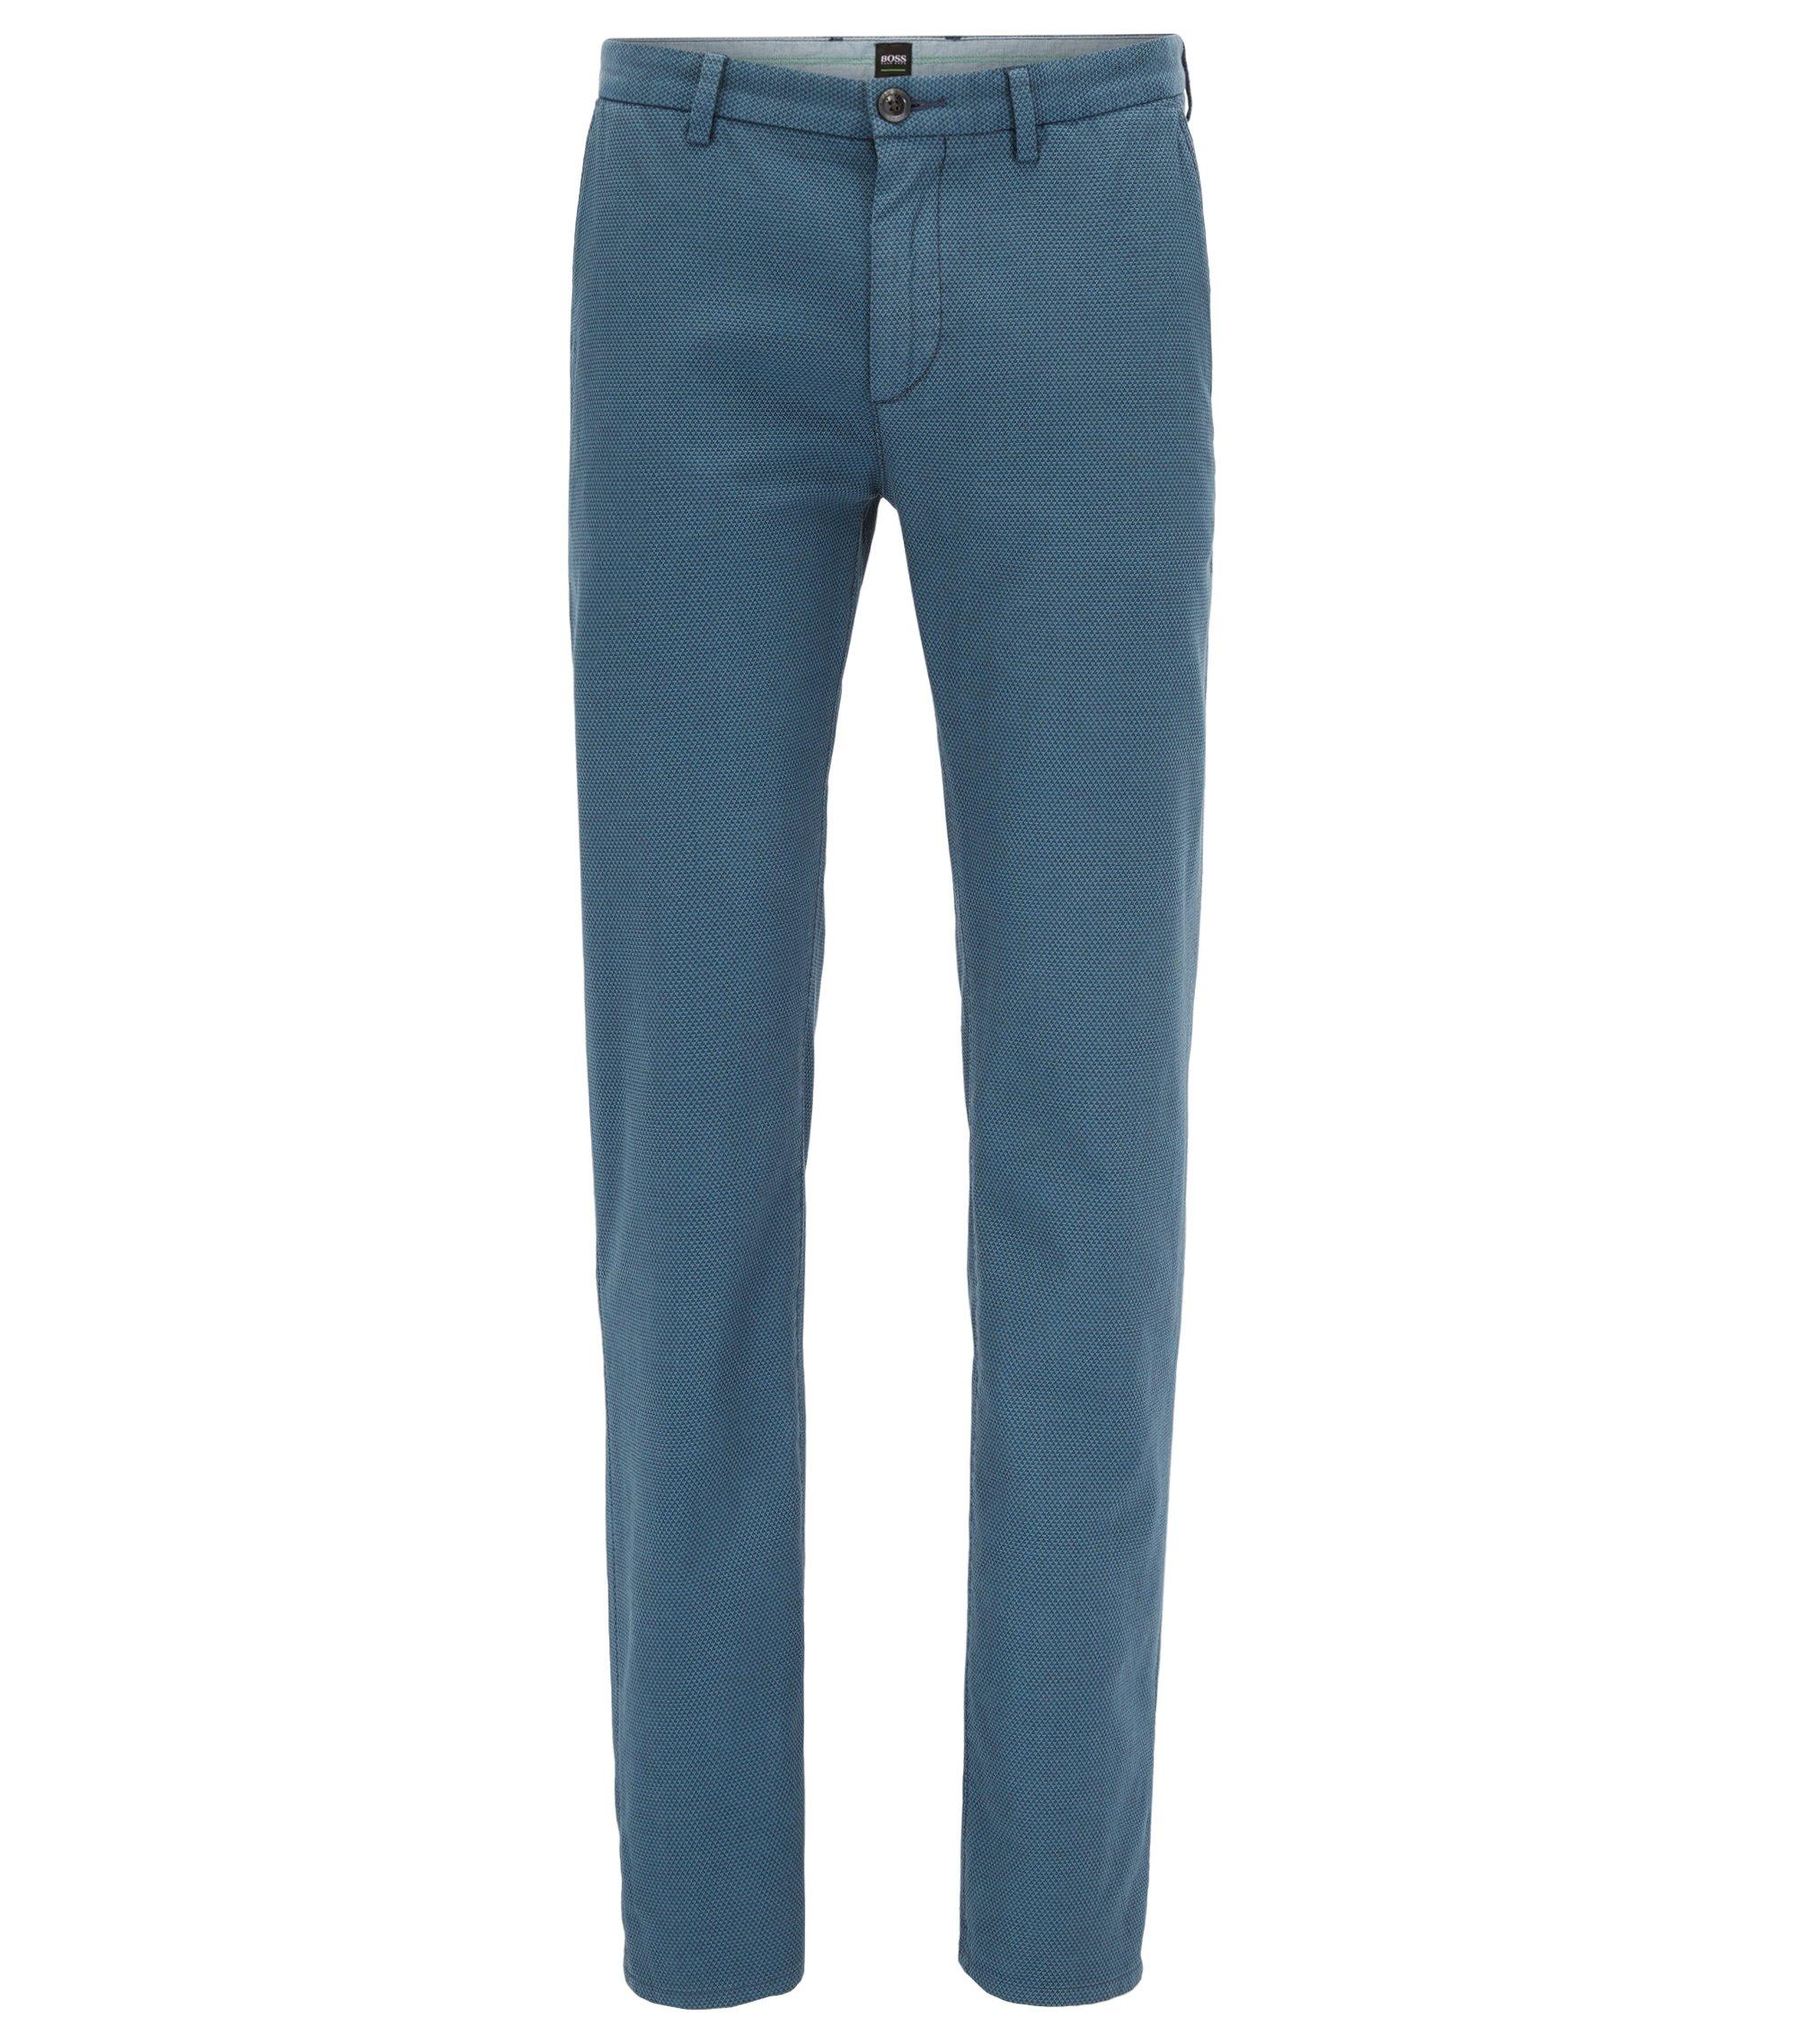 Stretch Cotton Chino Pant, Slim Fit | Rogan D, Silver